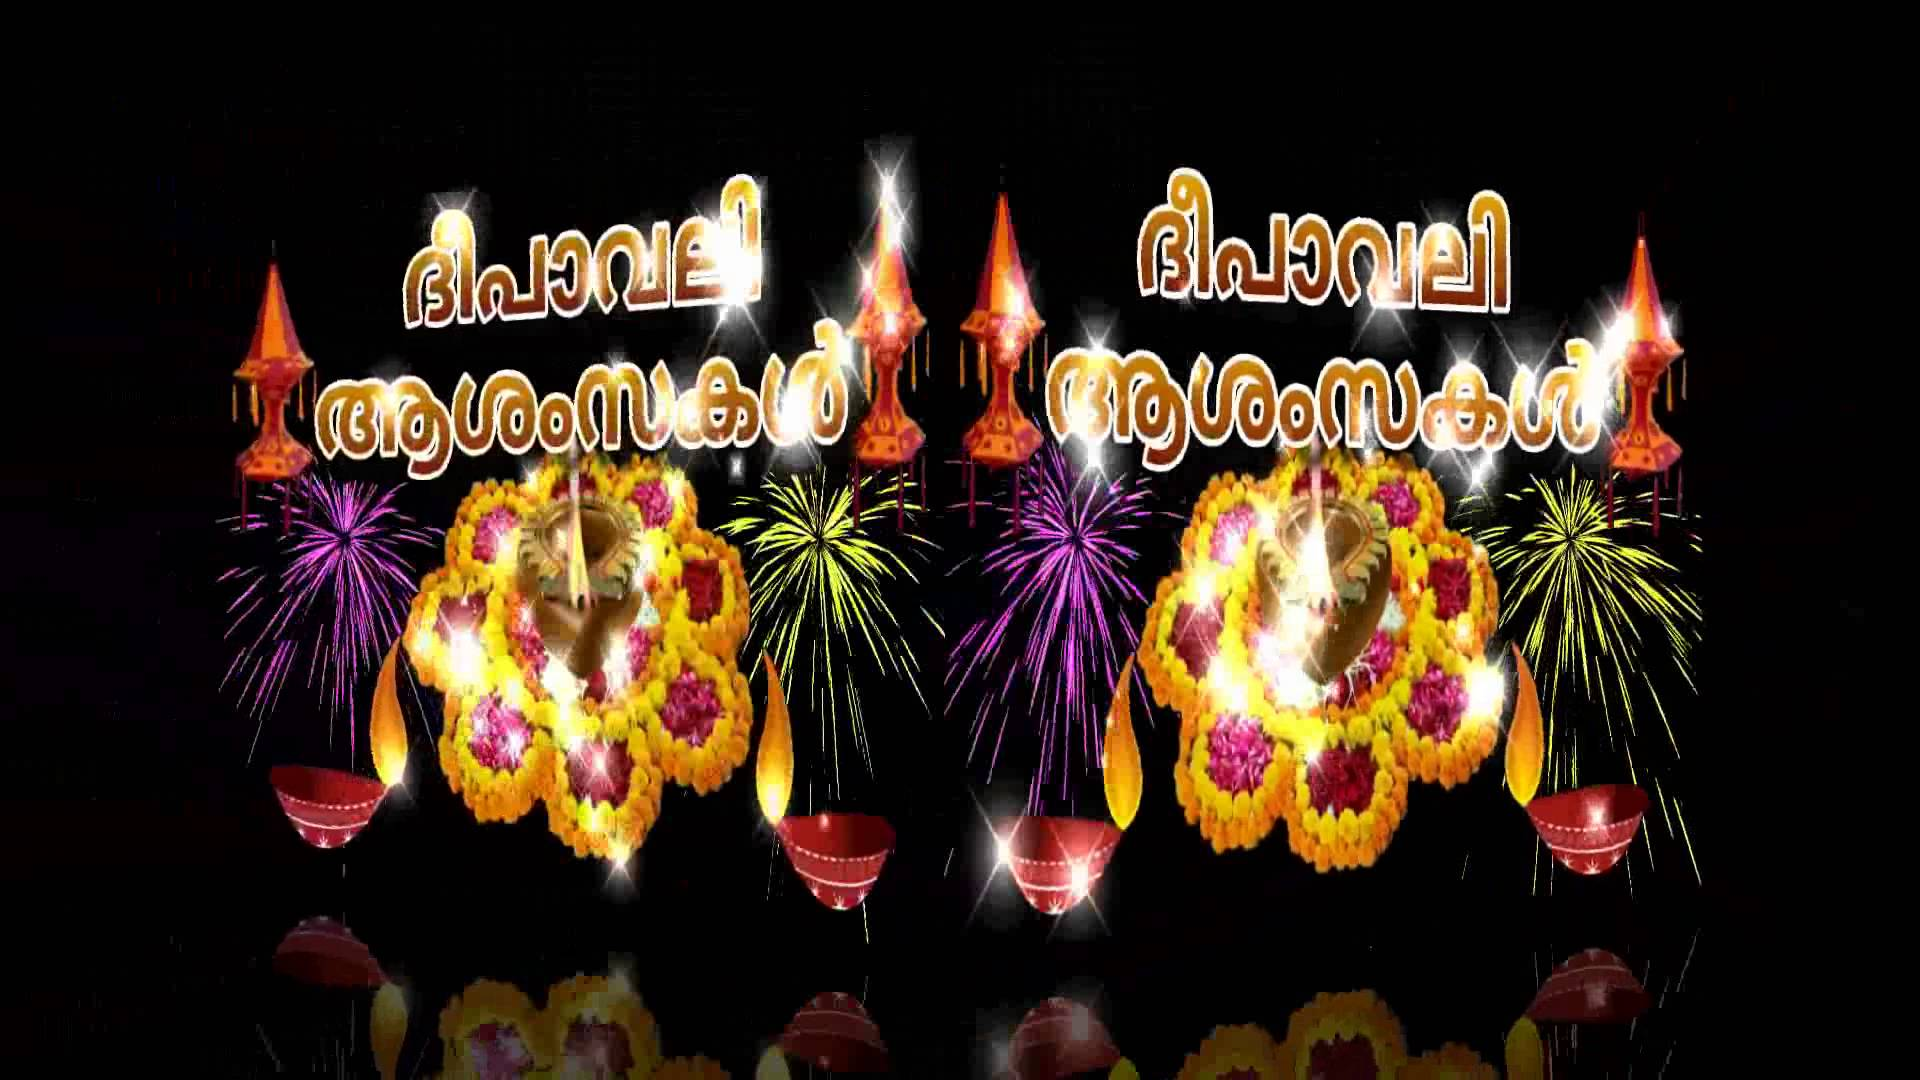 Happy Deepawali Wishes in Marathi